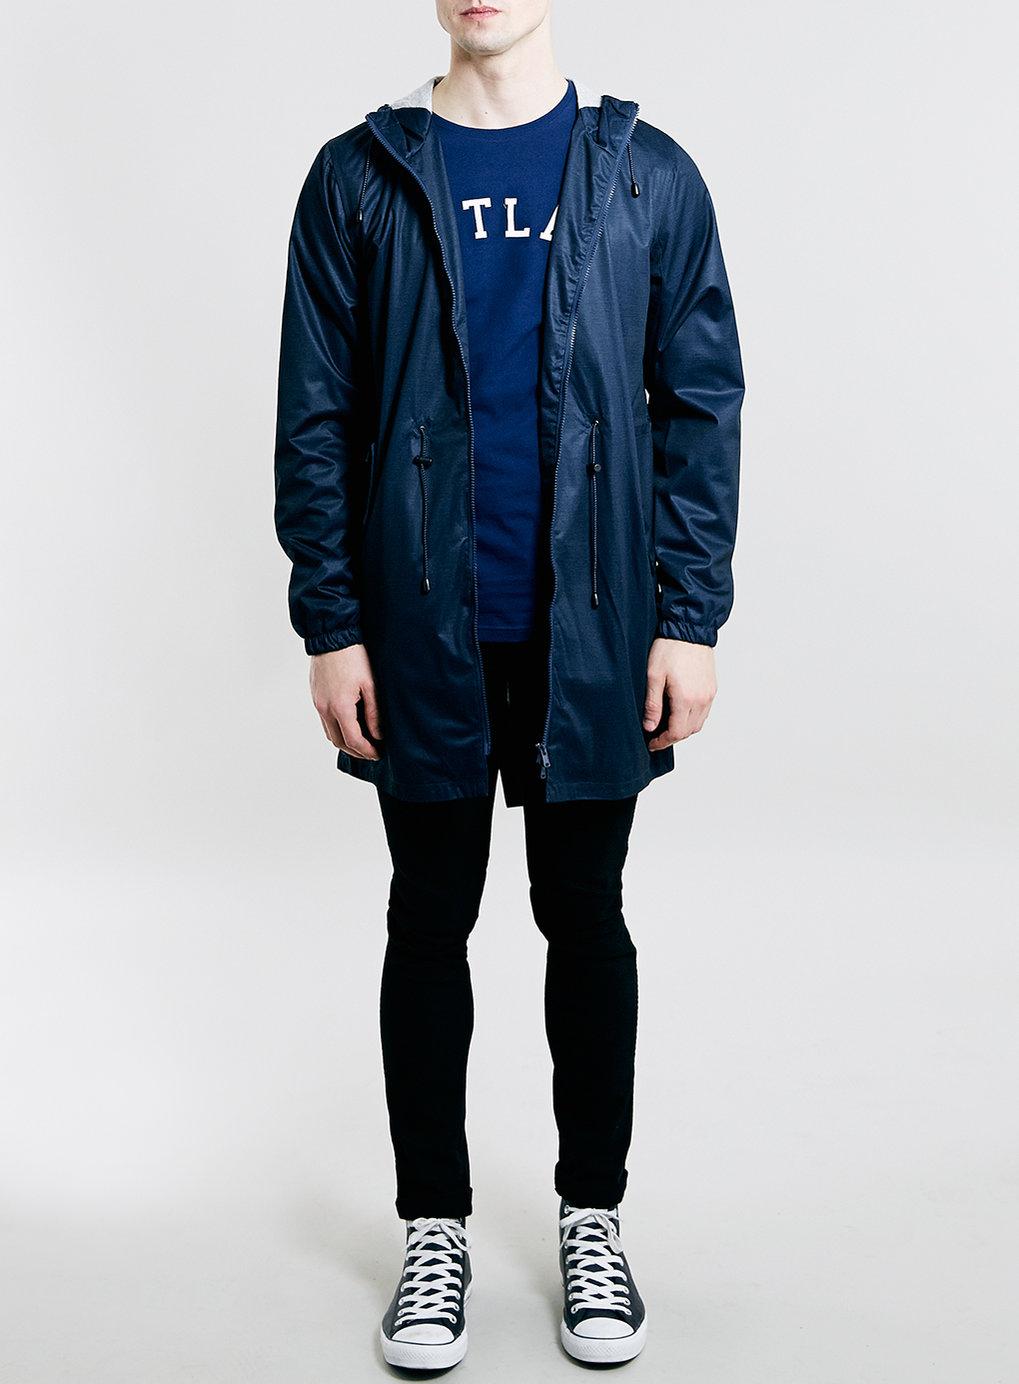 Topman navy portland slim fit t shirt in blue for men lyst for Navy slim fit shirt